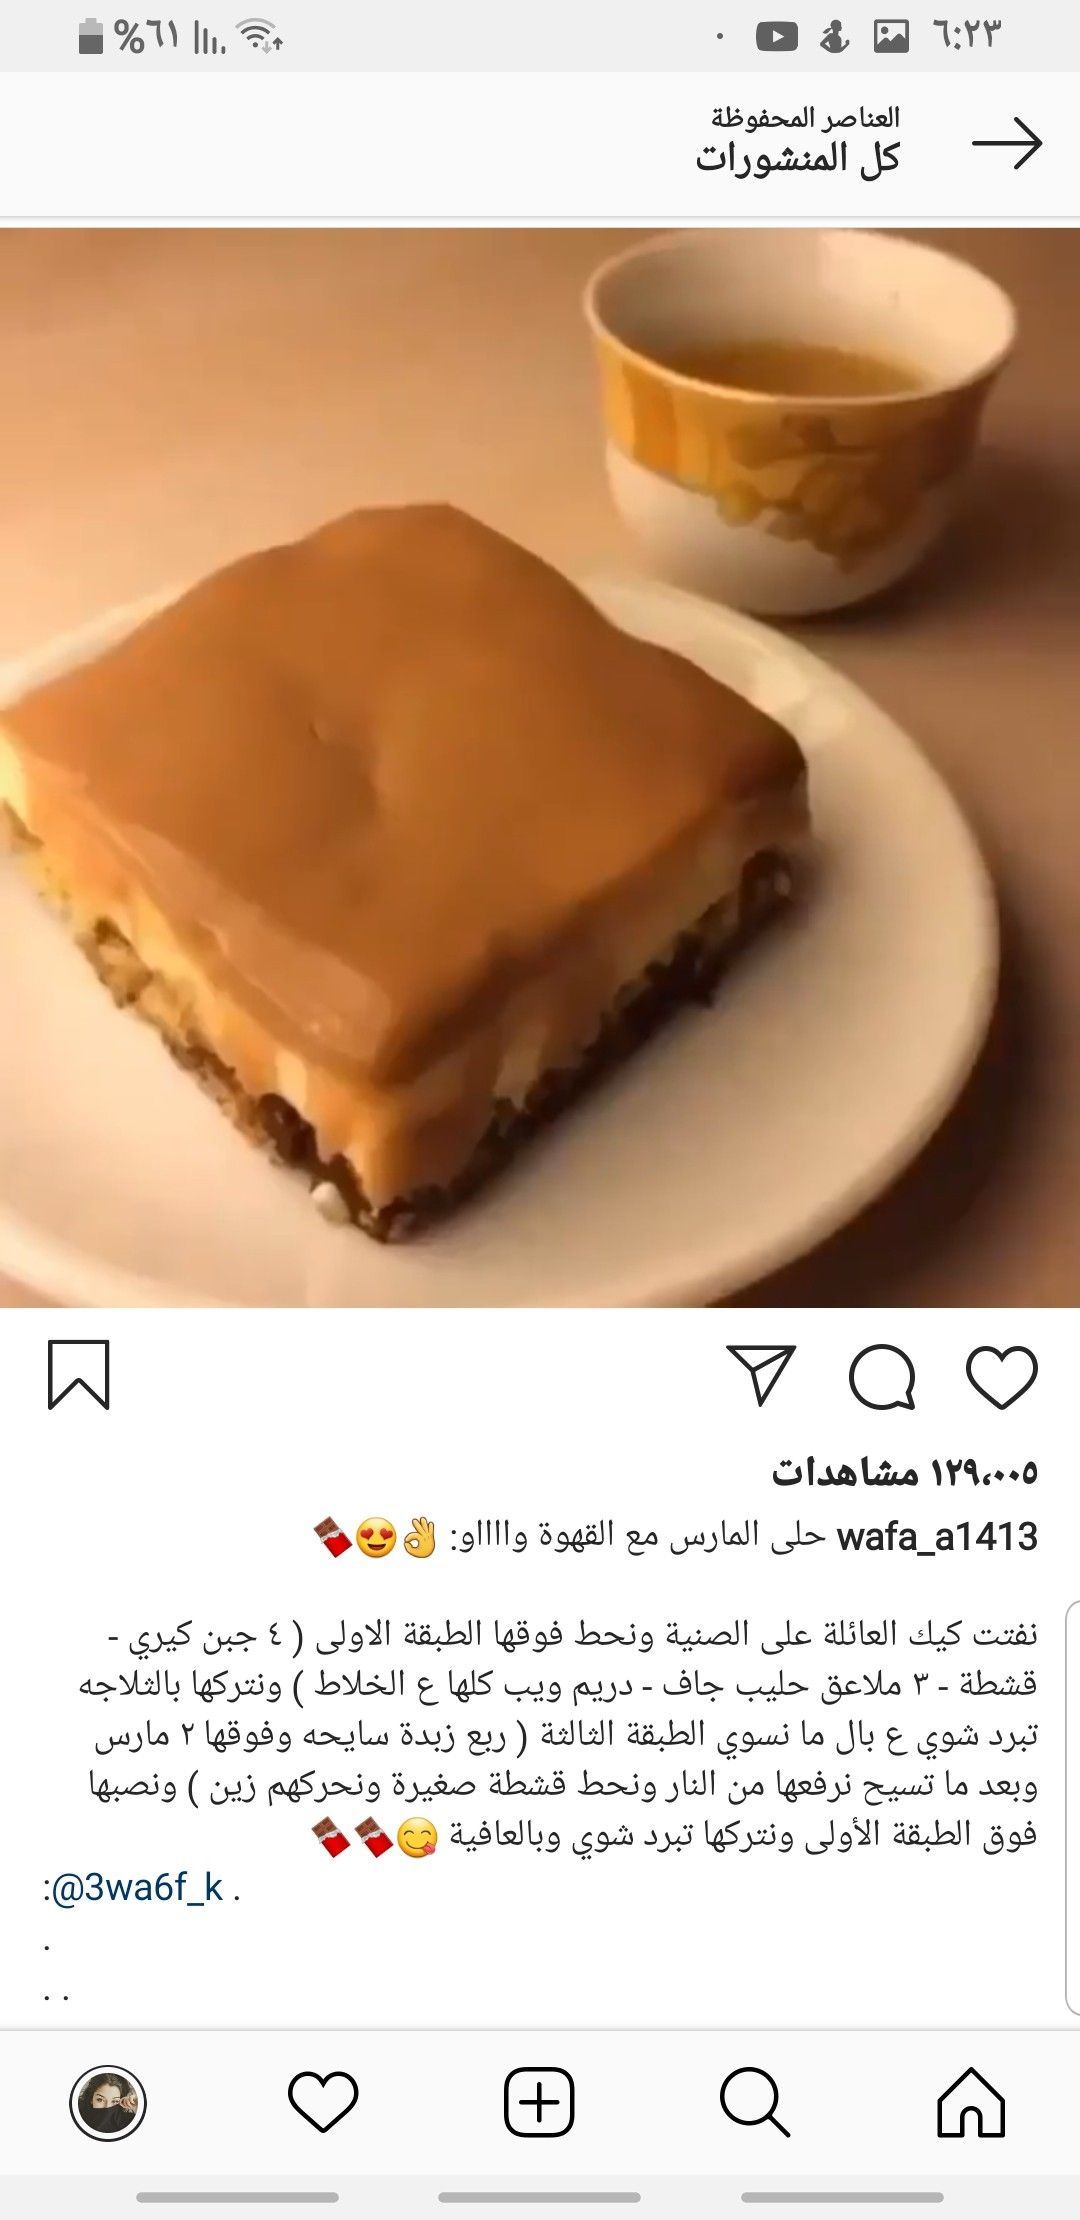 Pin By Tfa9il 123 On Food طبخ Sweets Recipes Food Recipes